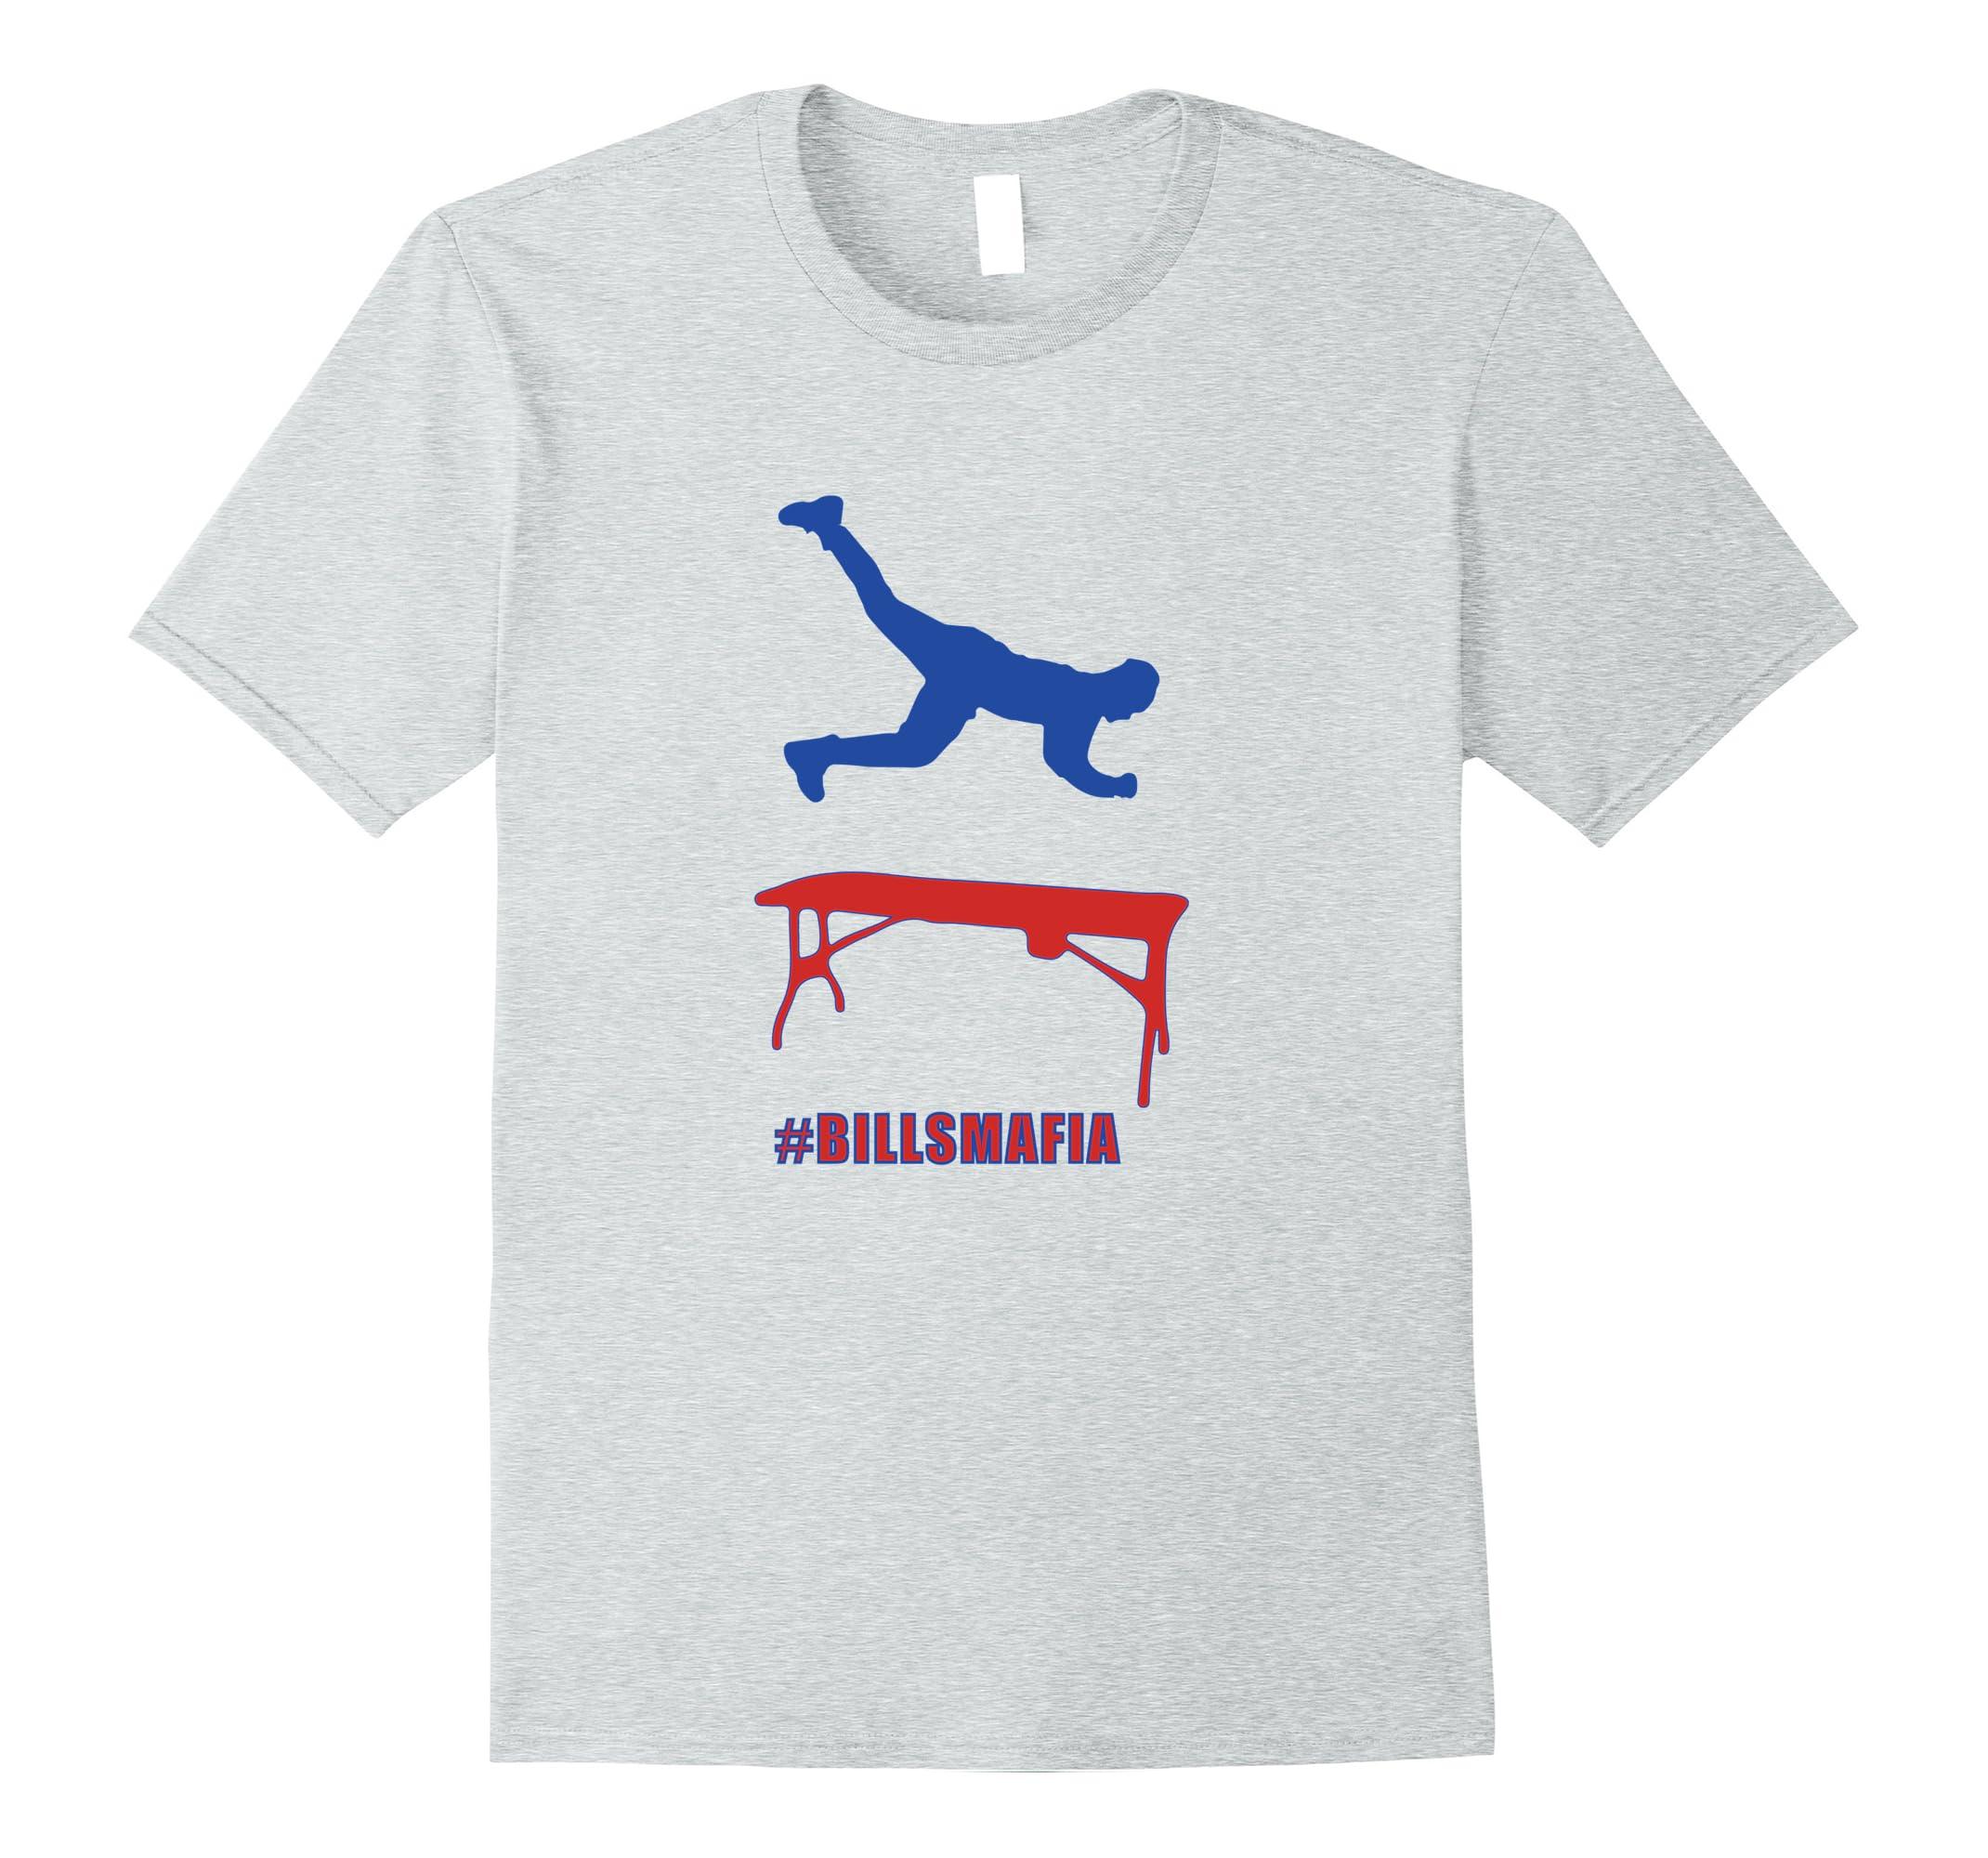 Bills Mafia Football T-Shirt-ah my shirt one gift